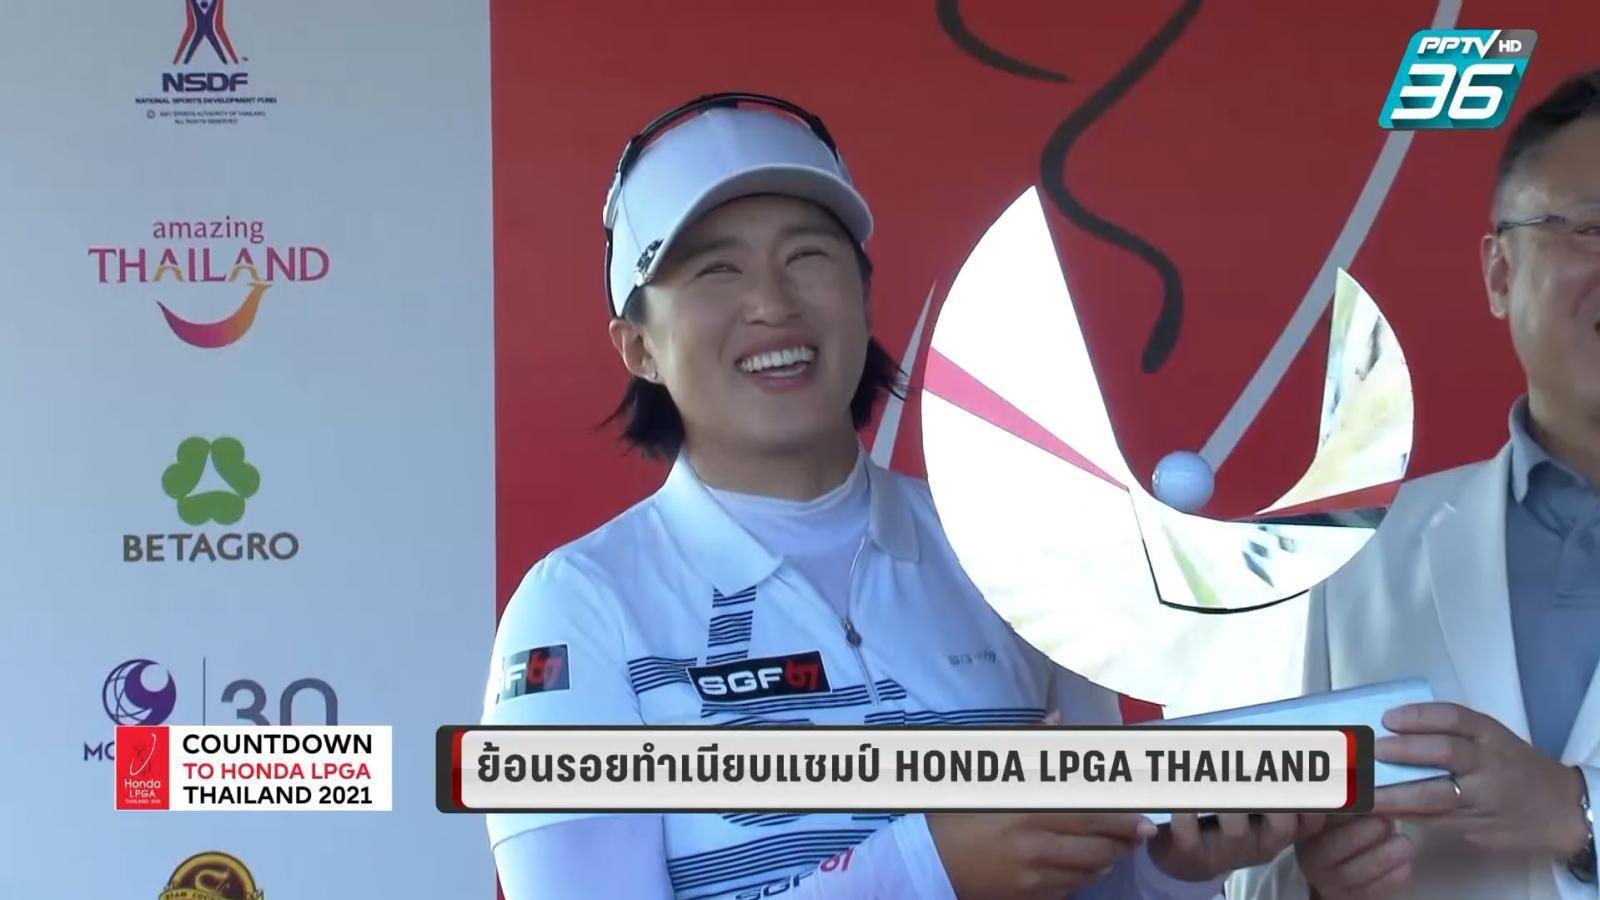 Countdown to Honda LPGA Thailand 2021